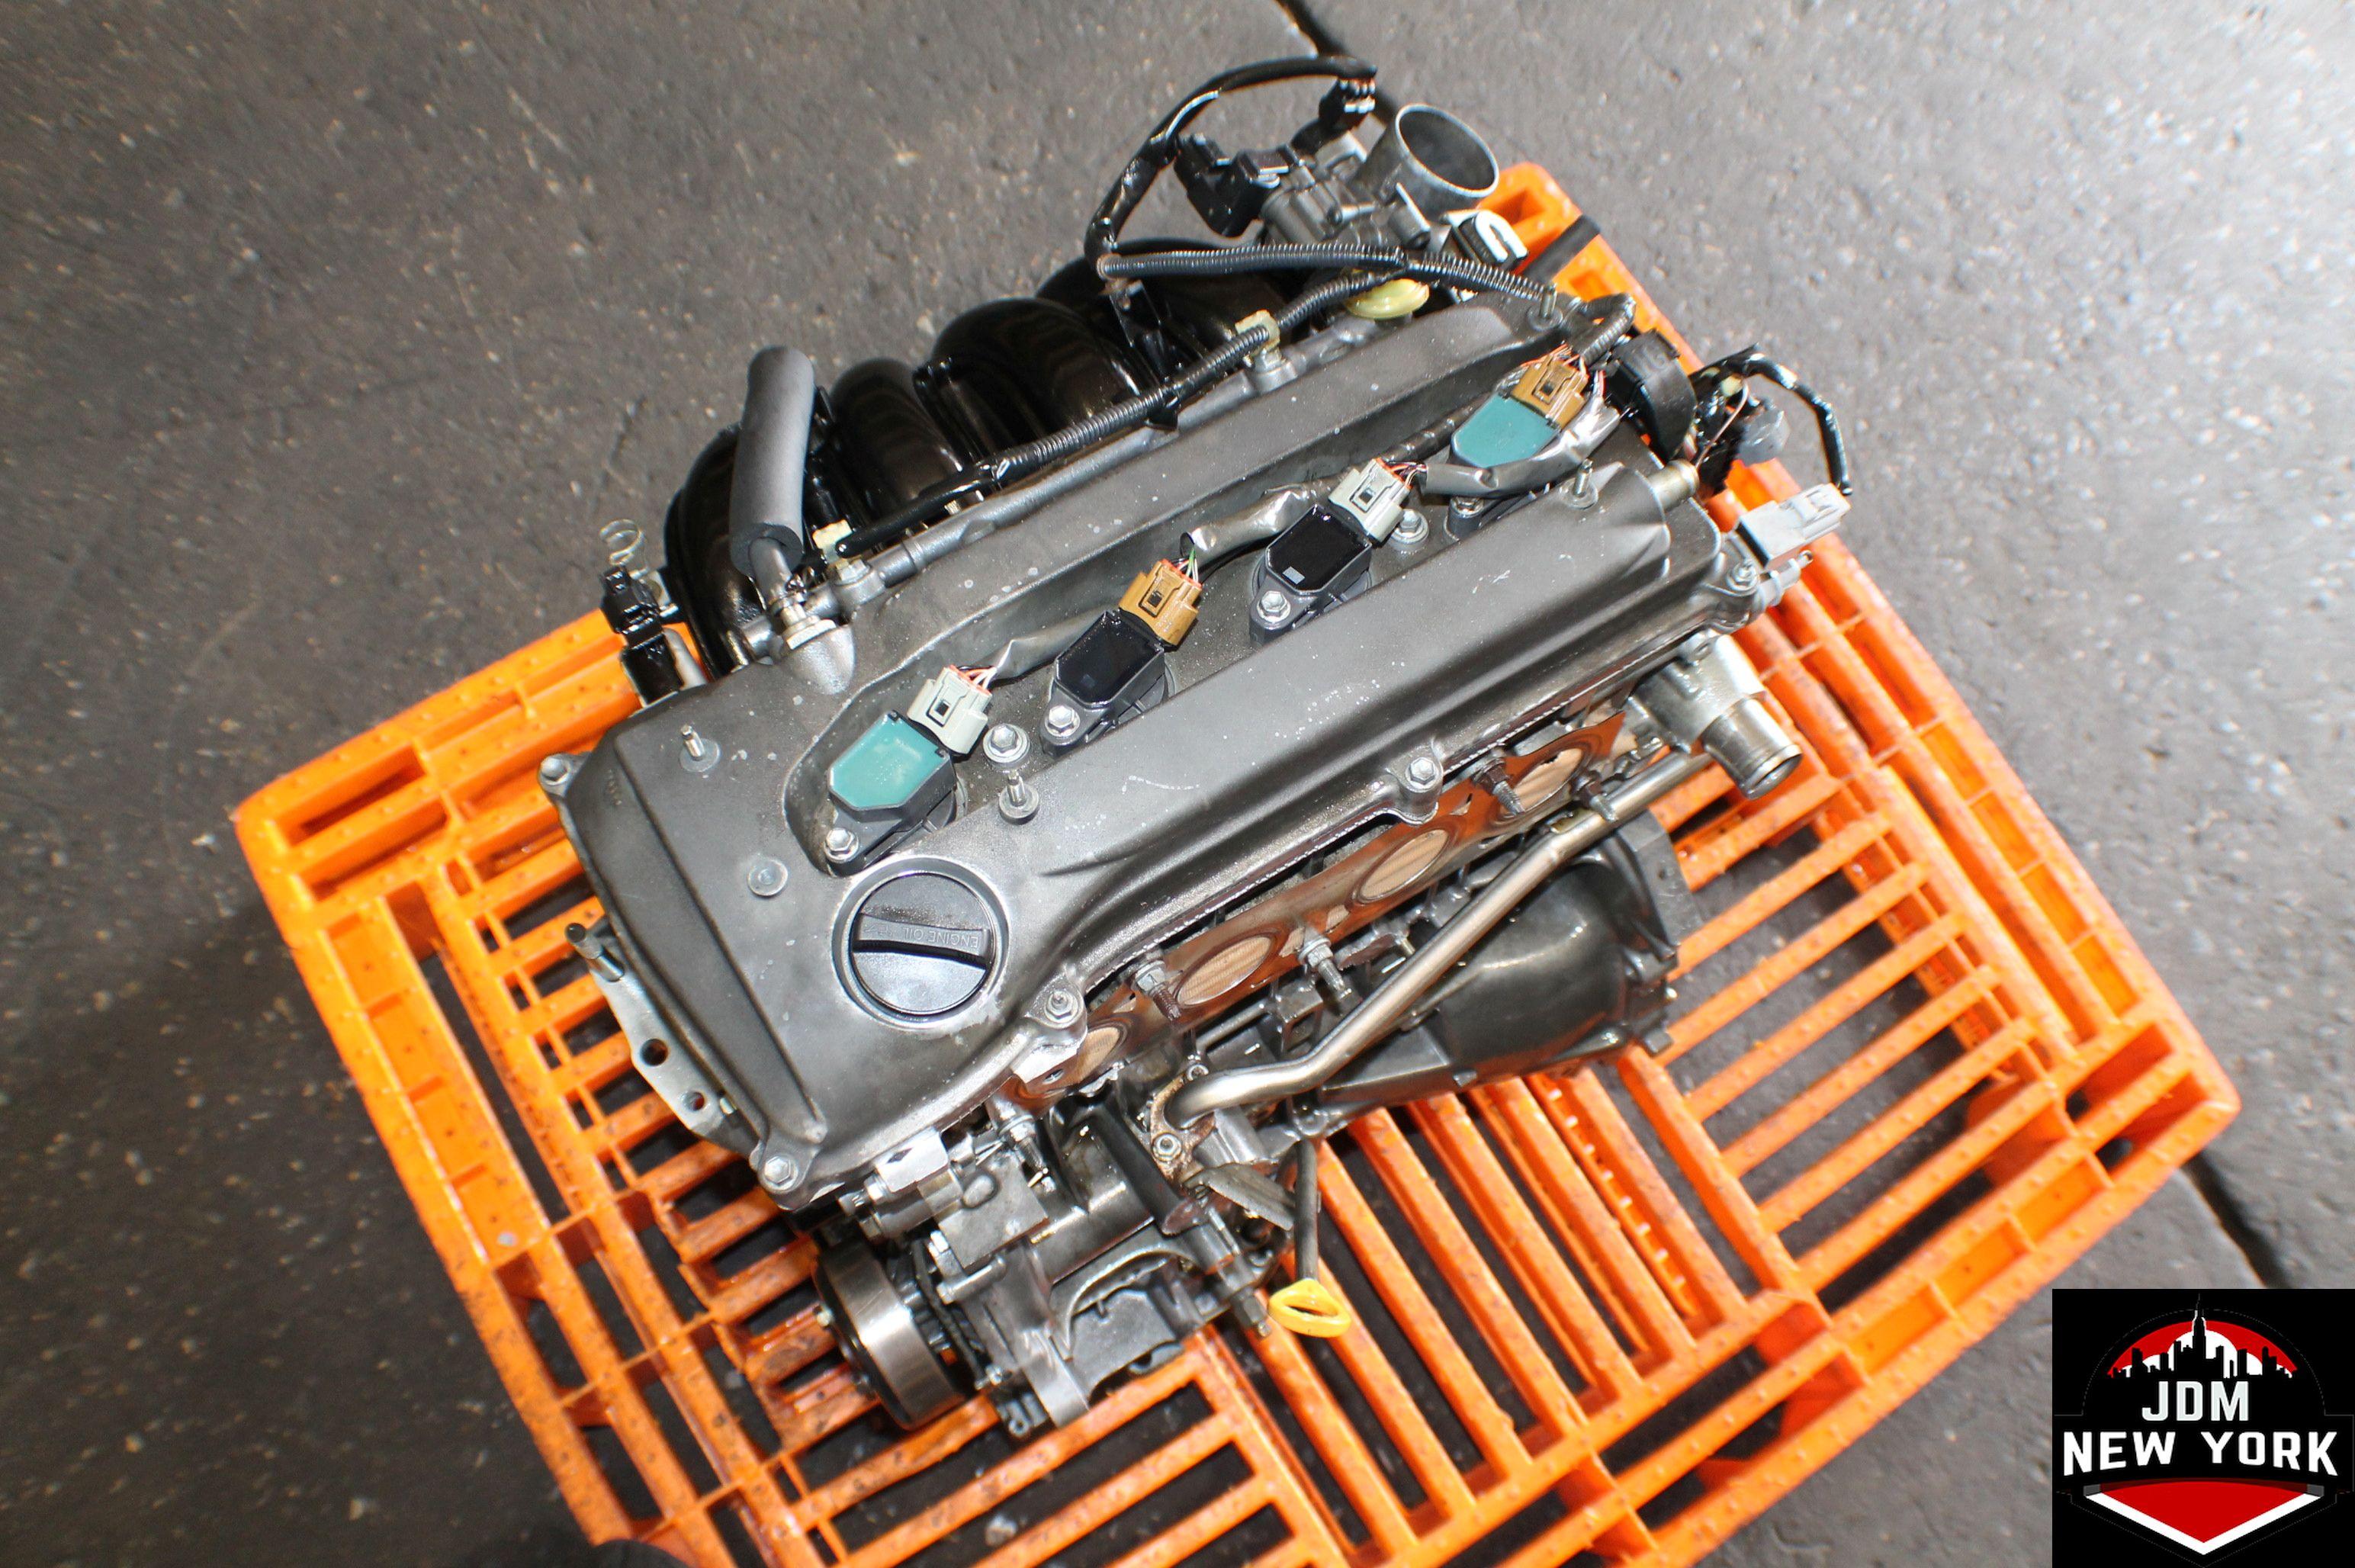 Toyota Camry 2 4 Twin Cam Engine Diagram Wiring Diagram Web A Web A Reteimpresesabina It